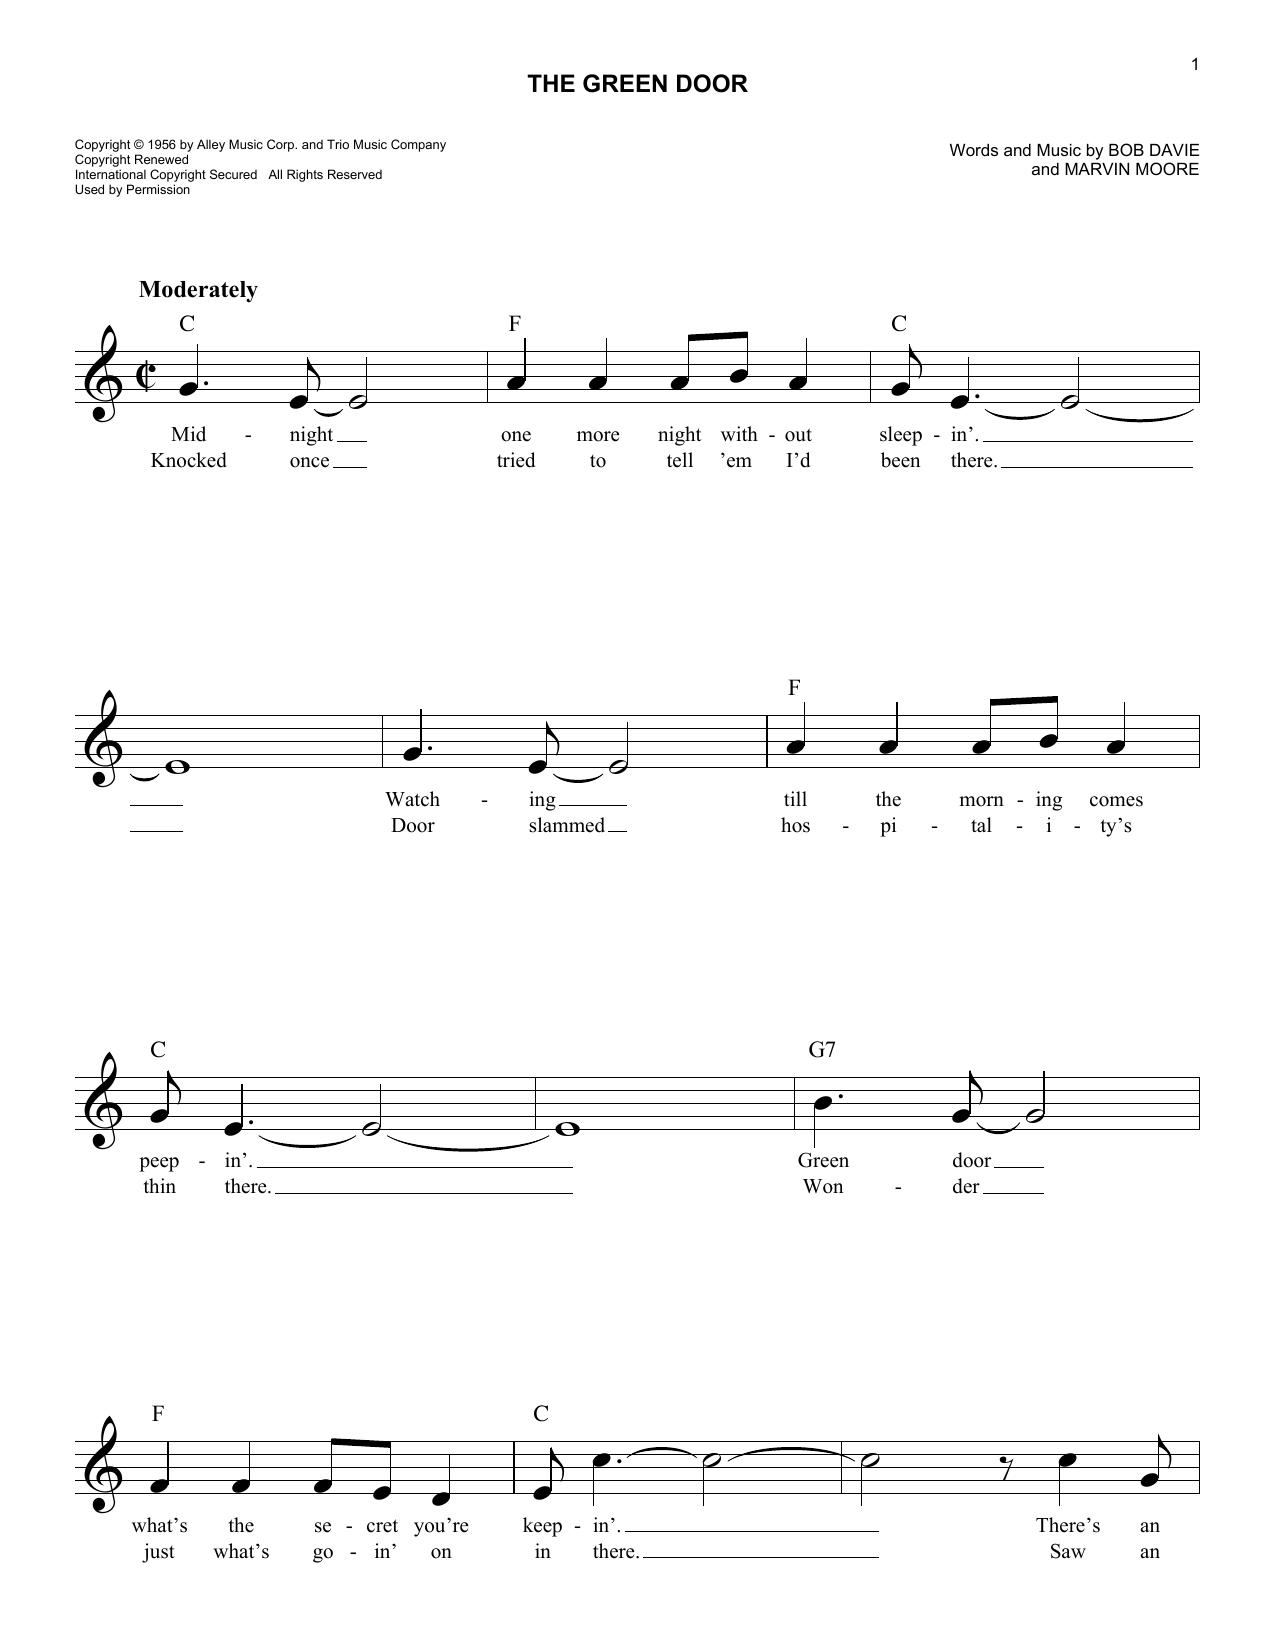 The Green Door Sheet Music